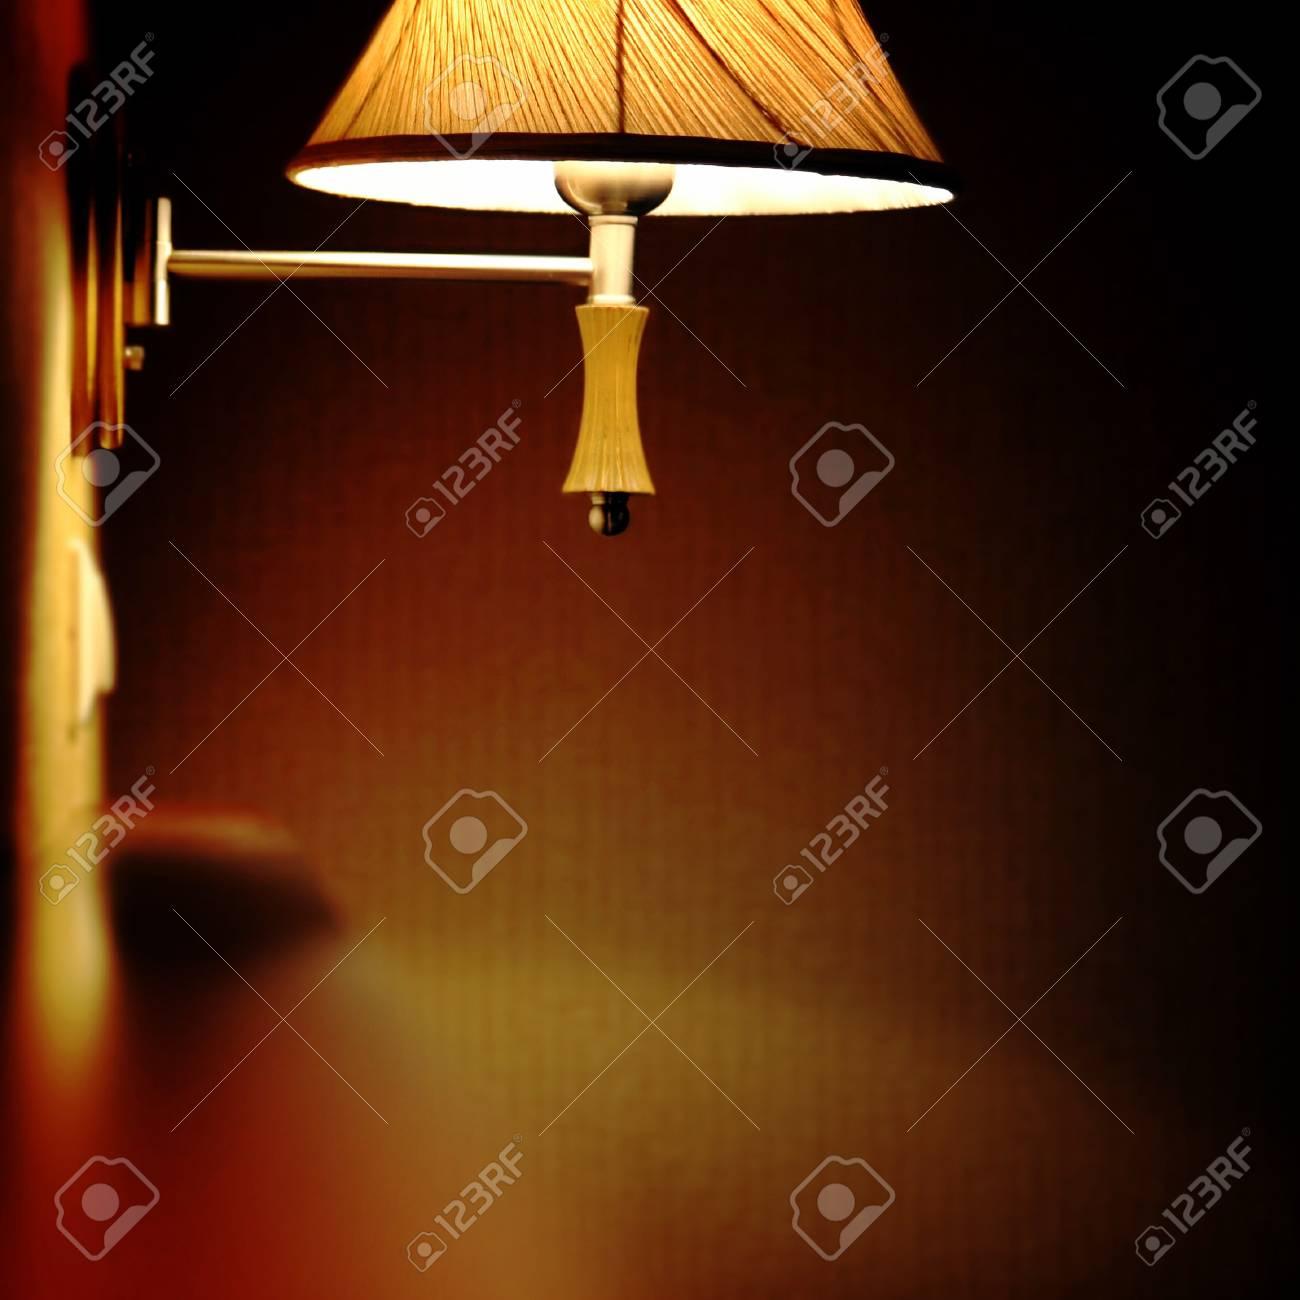 Blur picyure of an orange lamp. Stock Photo - 7869081